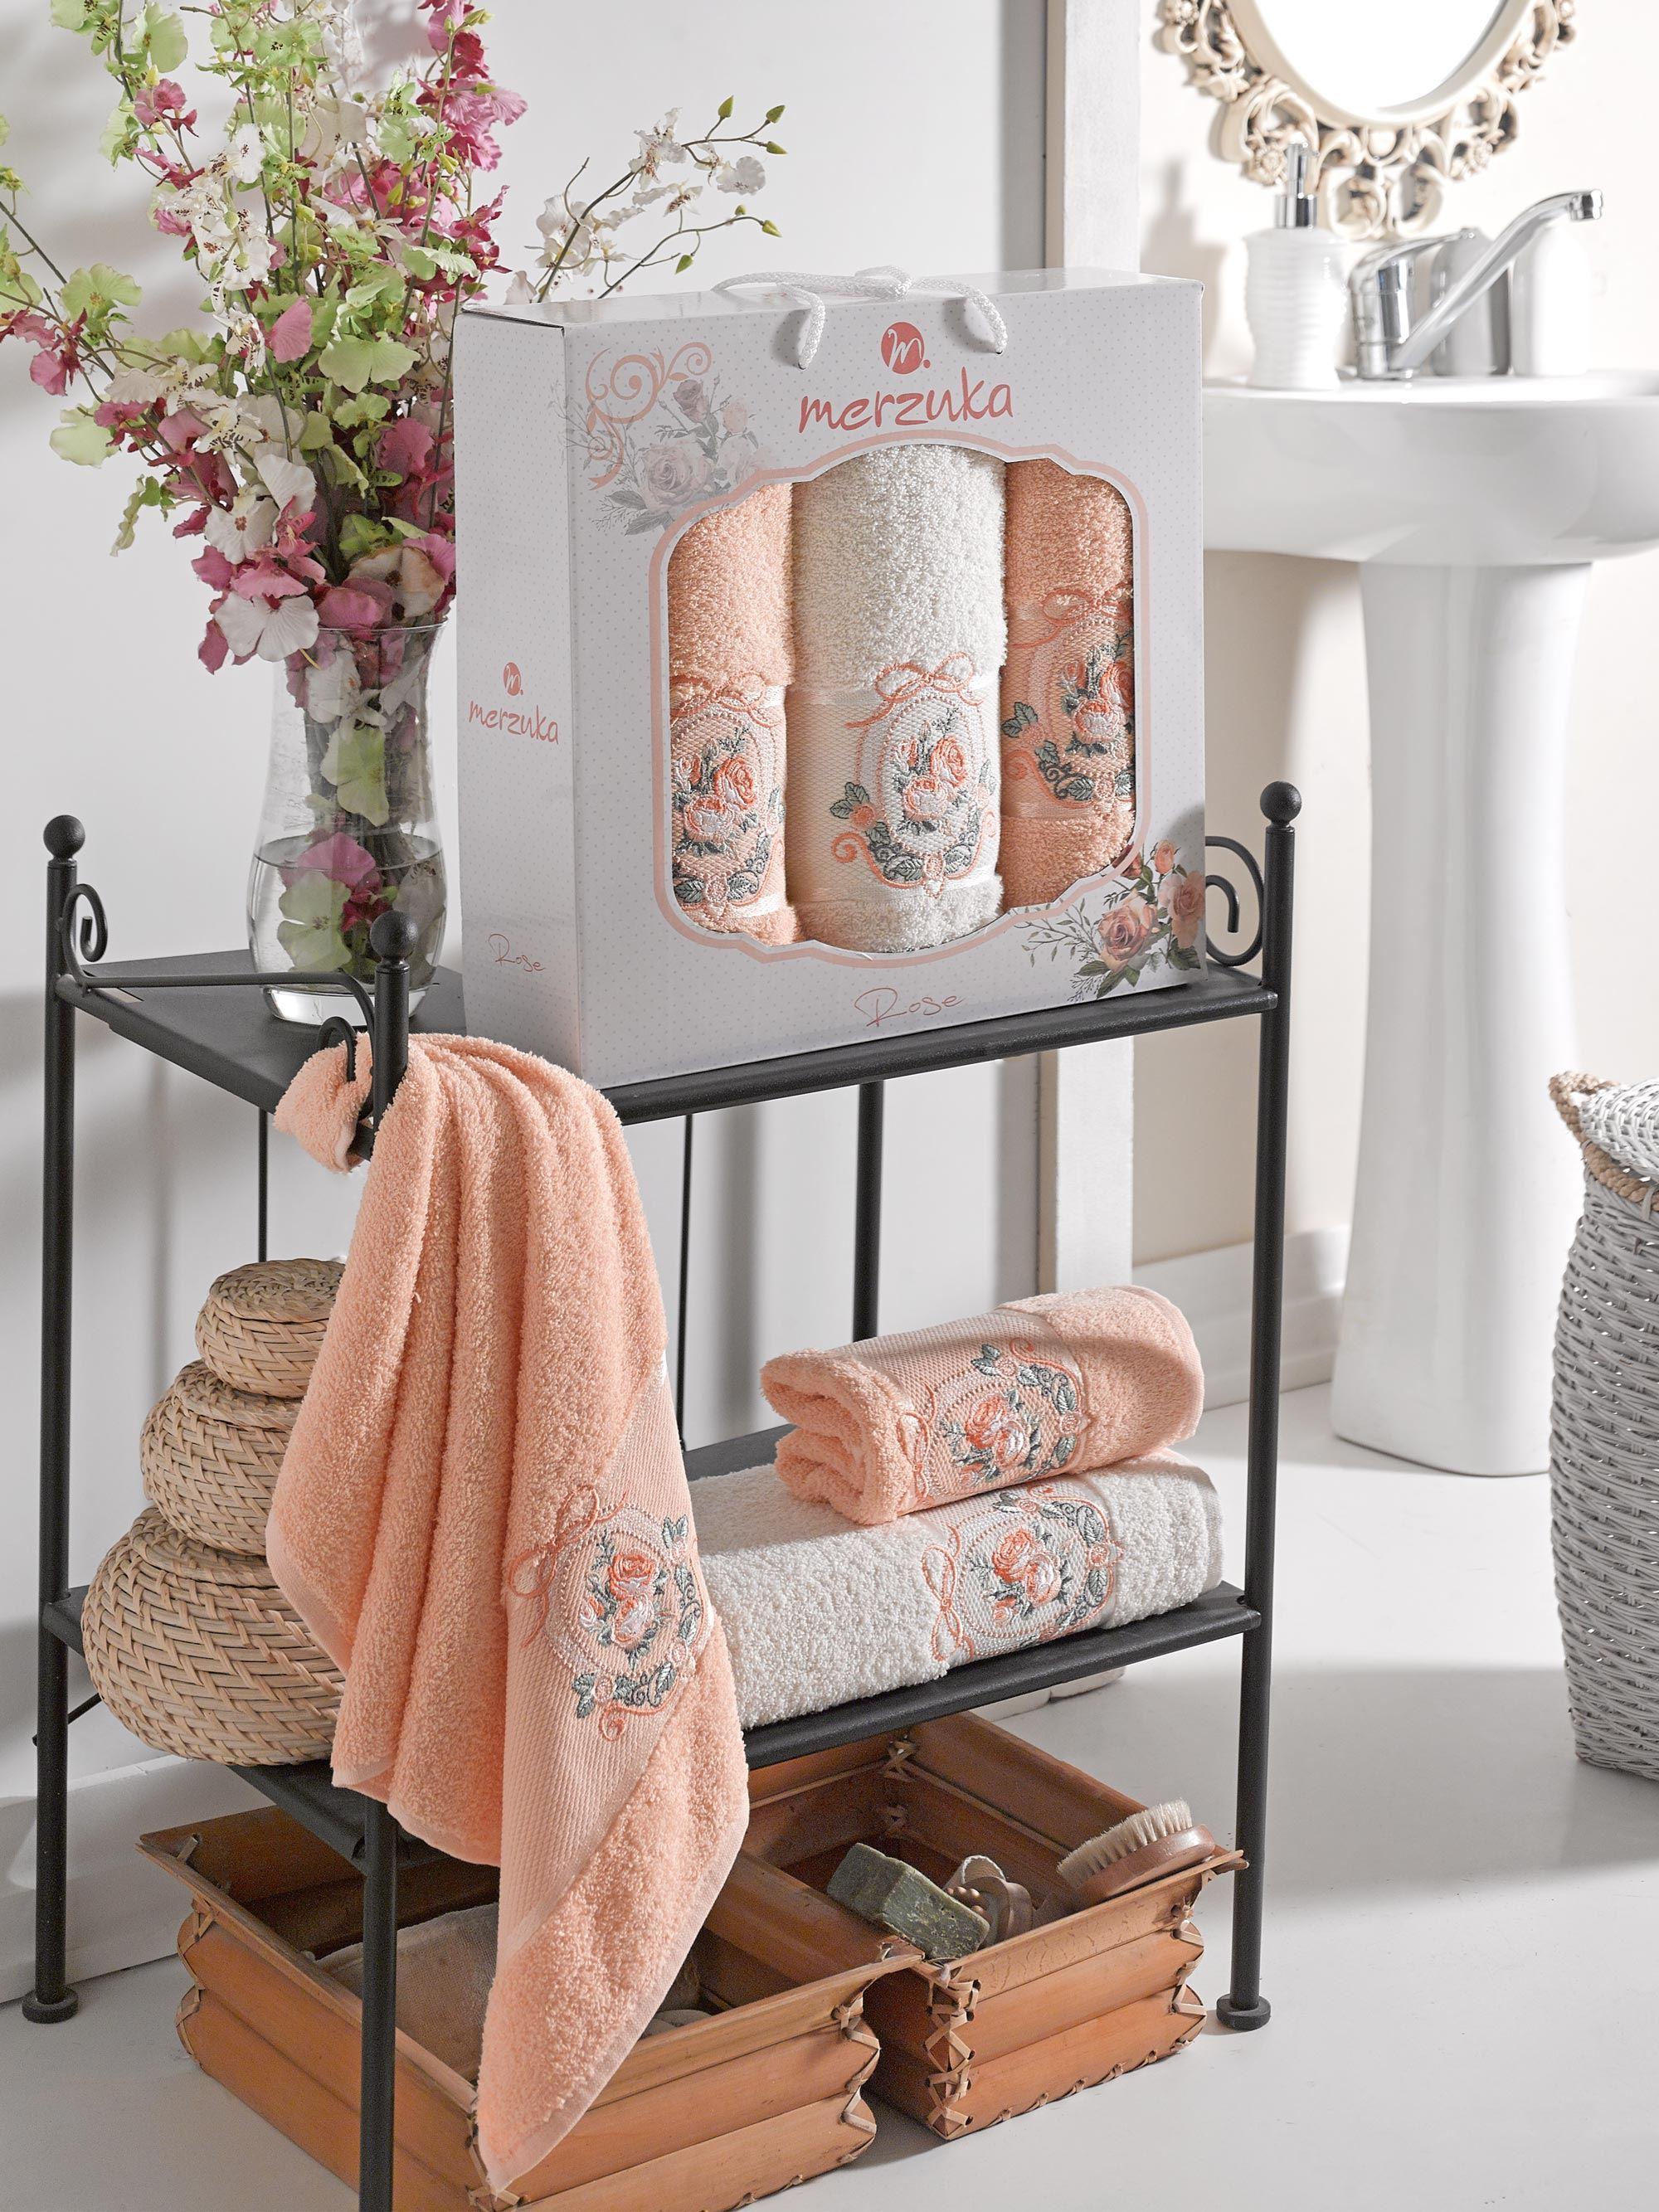 Полотенца Oran Merzuka Полотенце Rose Цвет: Оранжевый (50х80 см - 2 шт,70х130 см) оранжевый prime м 50х90 70х130 в коробке набор полотенец фиеста